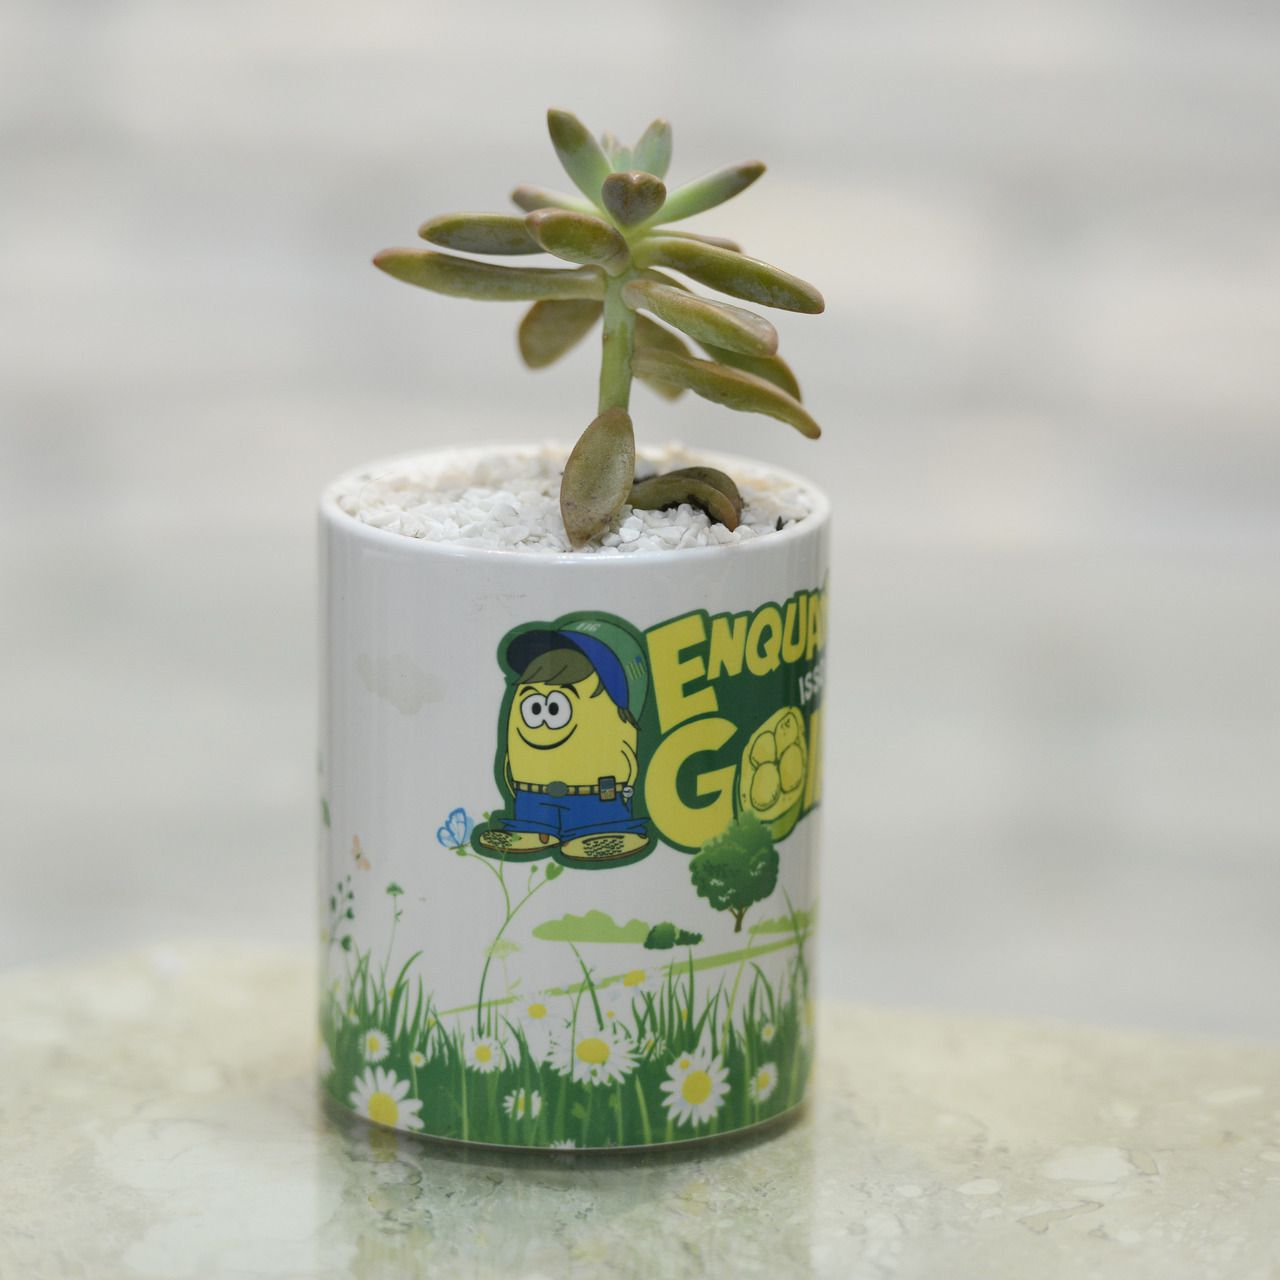 Planta na Caneca 2x1 - Cacto + Suculenta